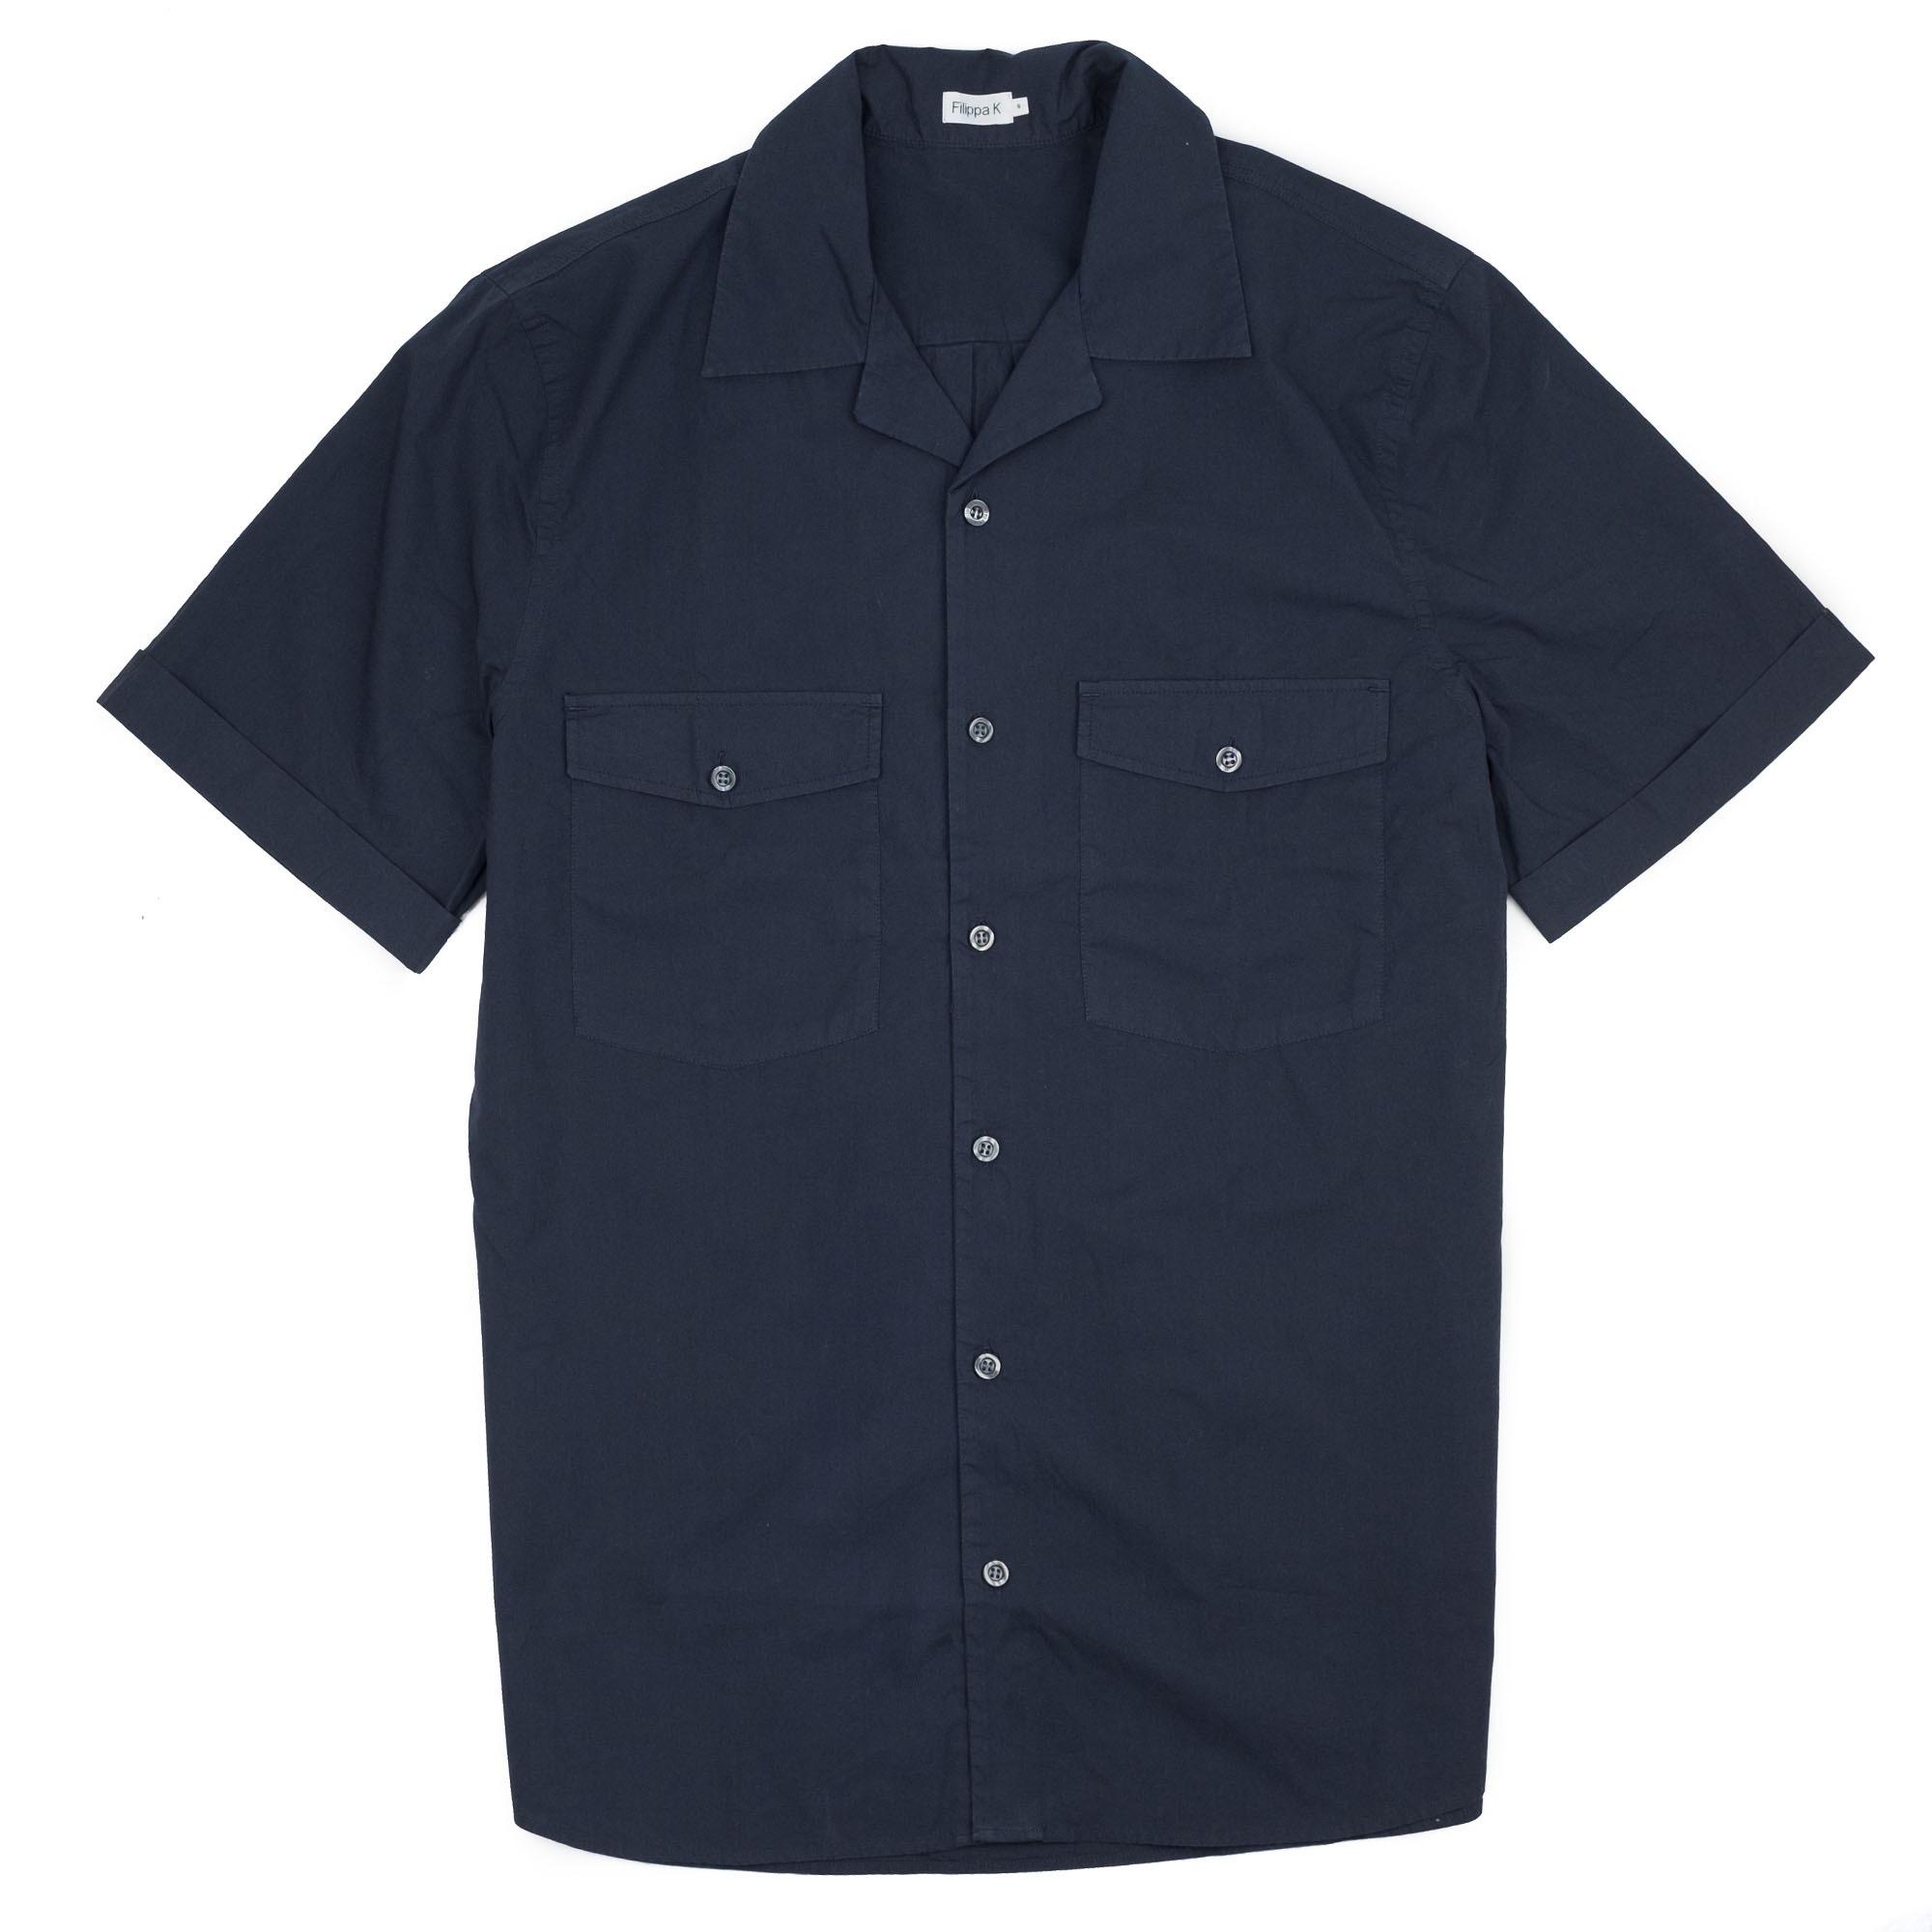 Filippa K Don Washed Poplin Shirt - Dk. Navy